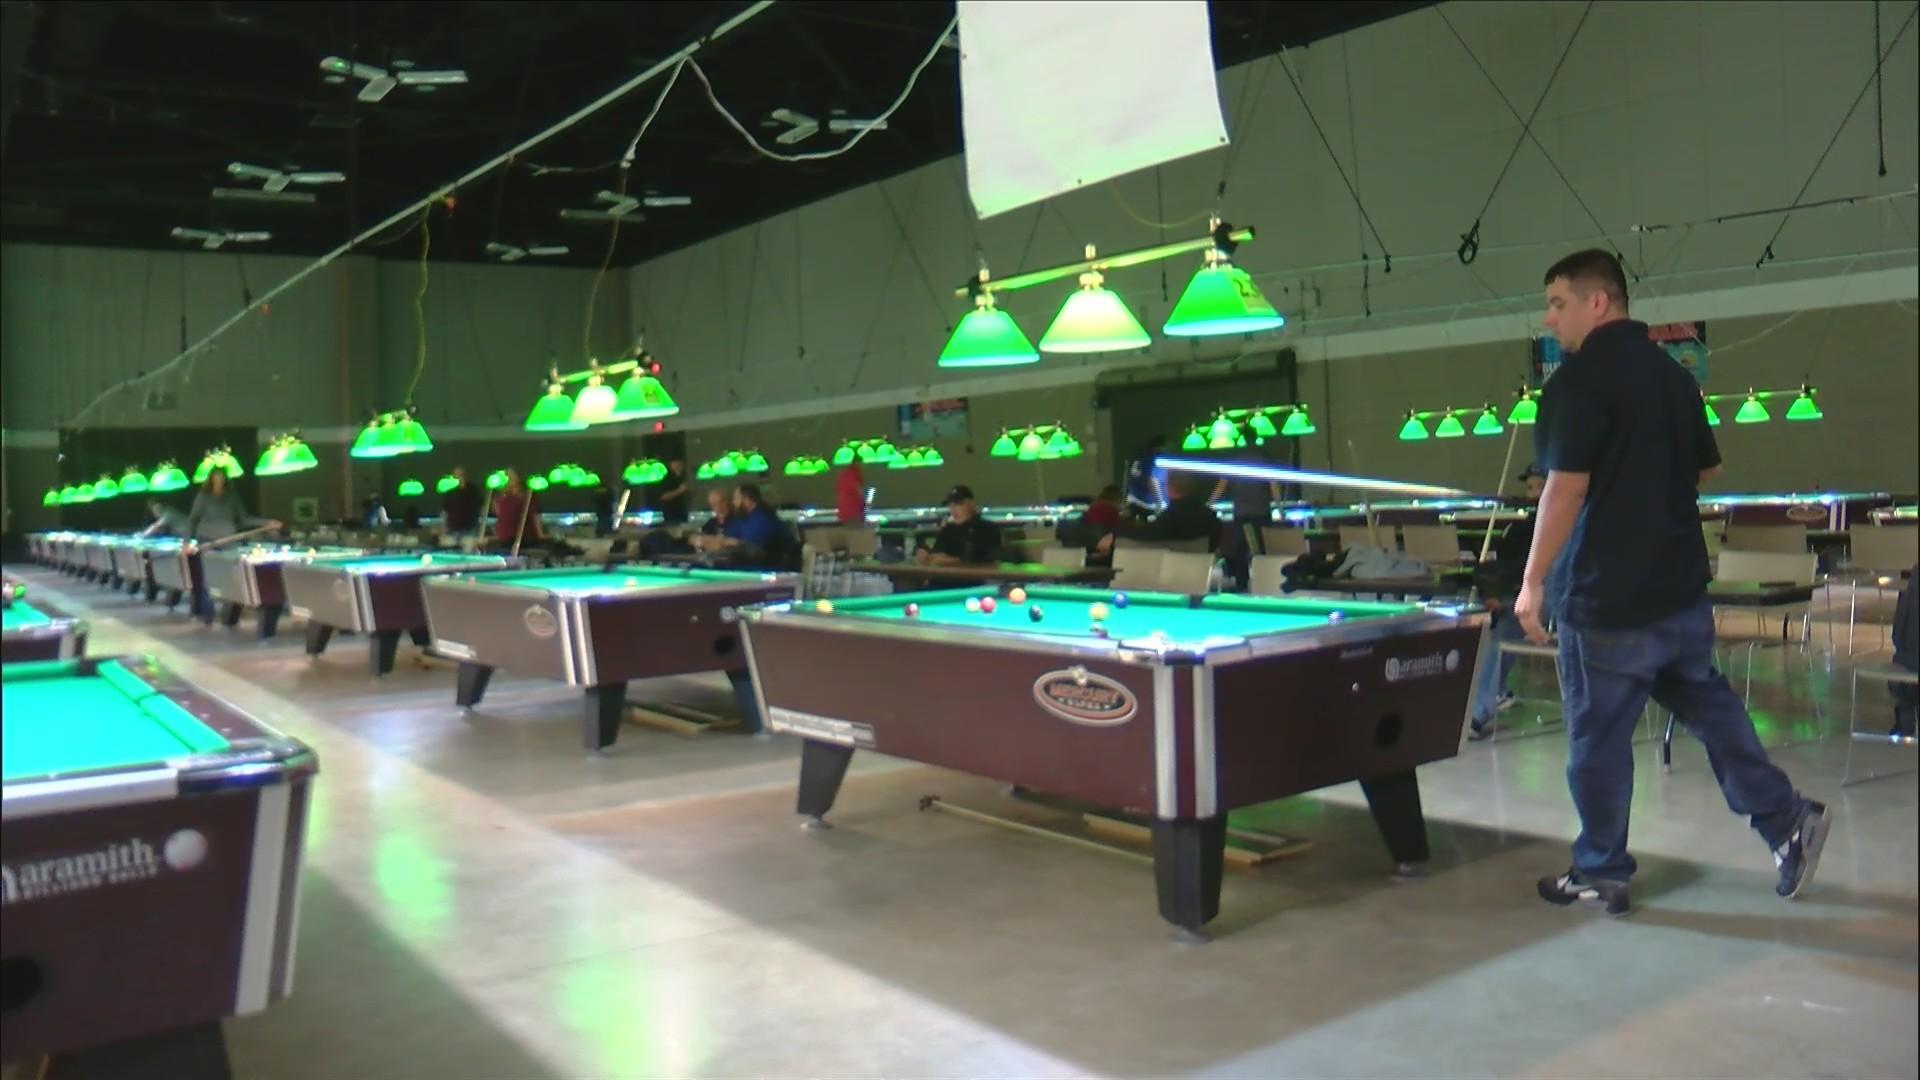 Billiards tournament